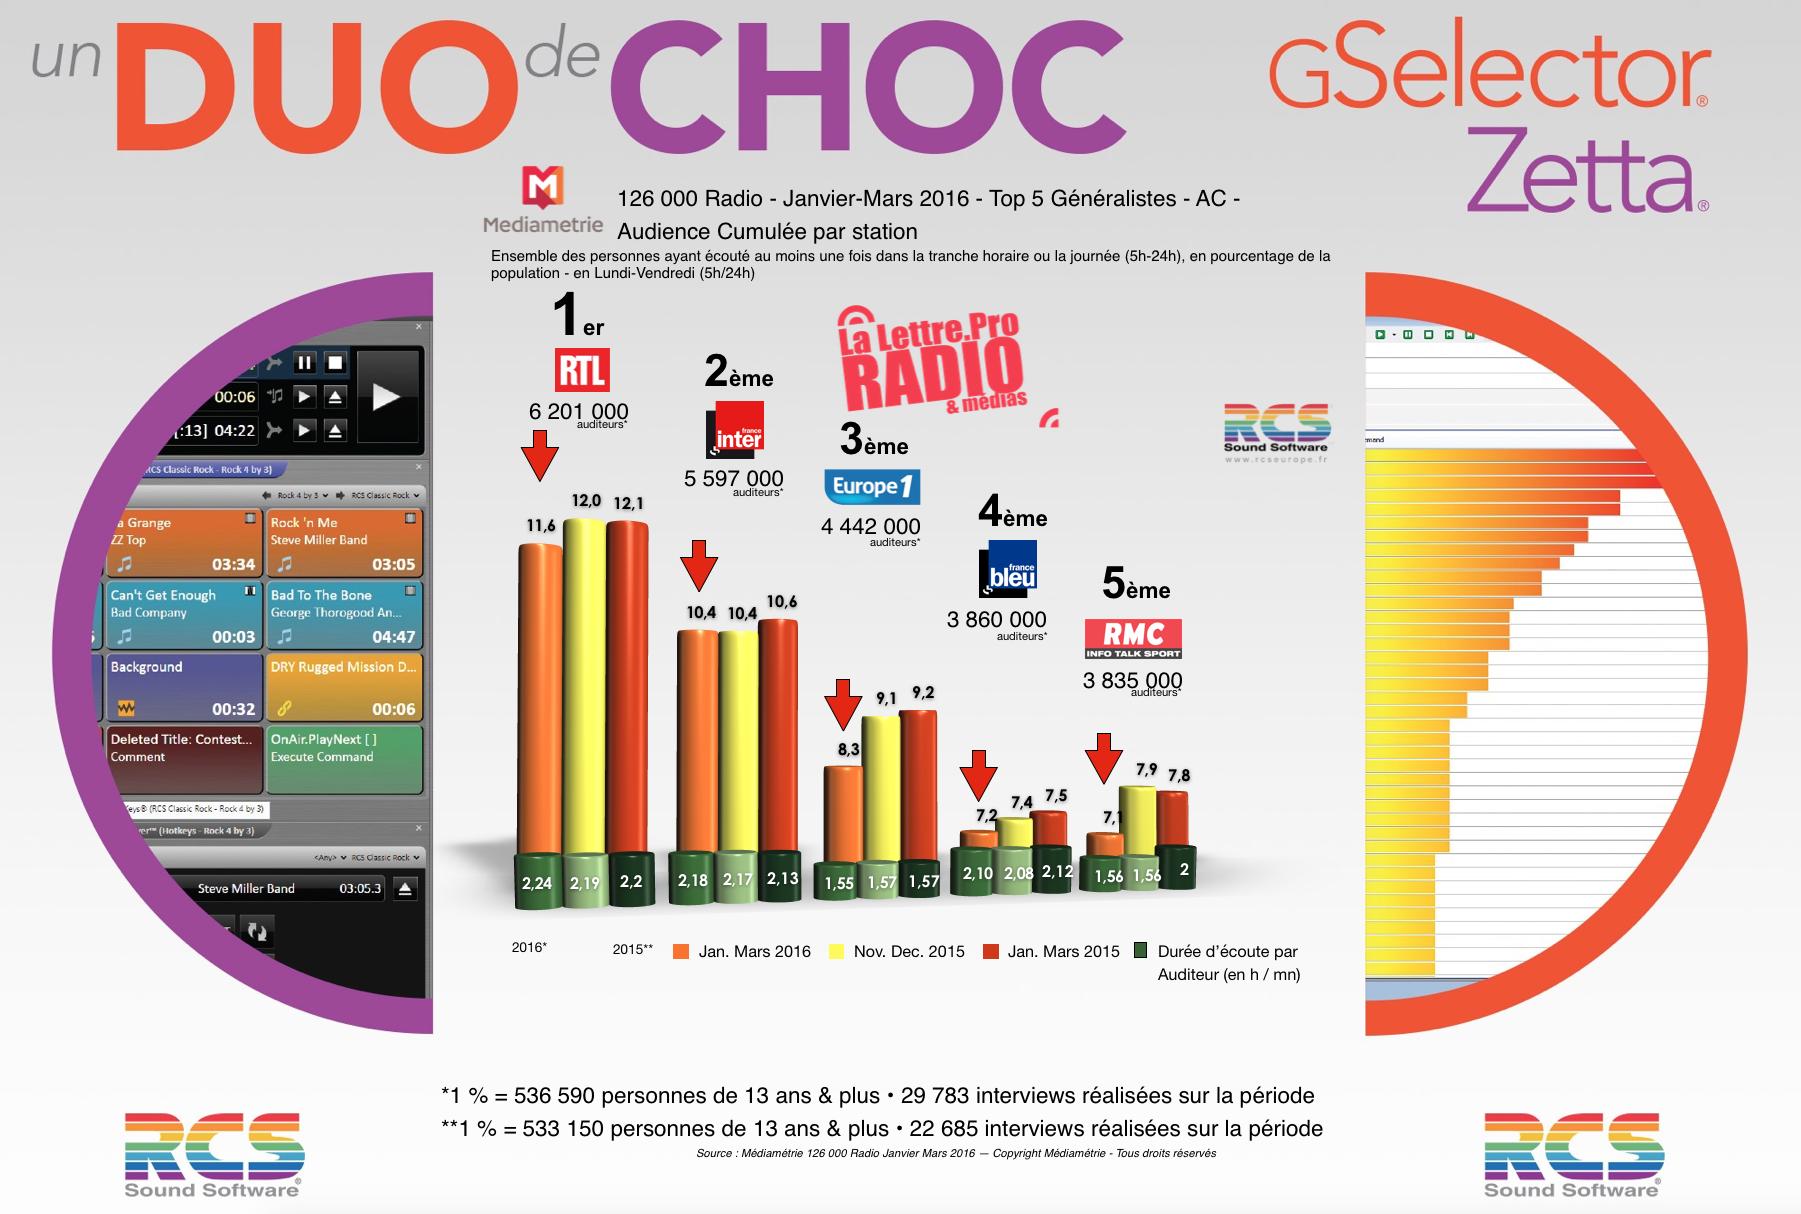 Diagramme exclusif LLP/RCS GSelector 4 - TOP 5 radios Généralistes en Lundi-Vendredi - 126 000 Radio Janvier-Mars 2016